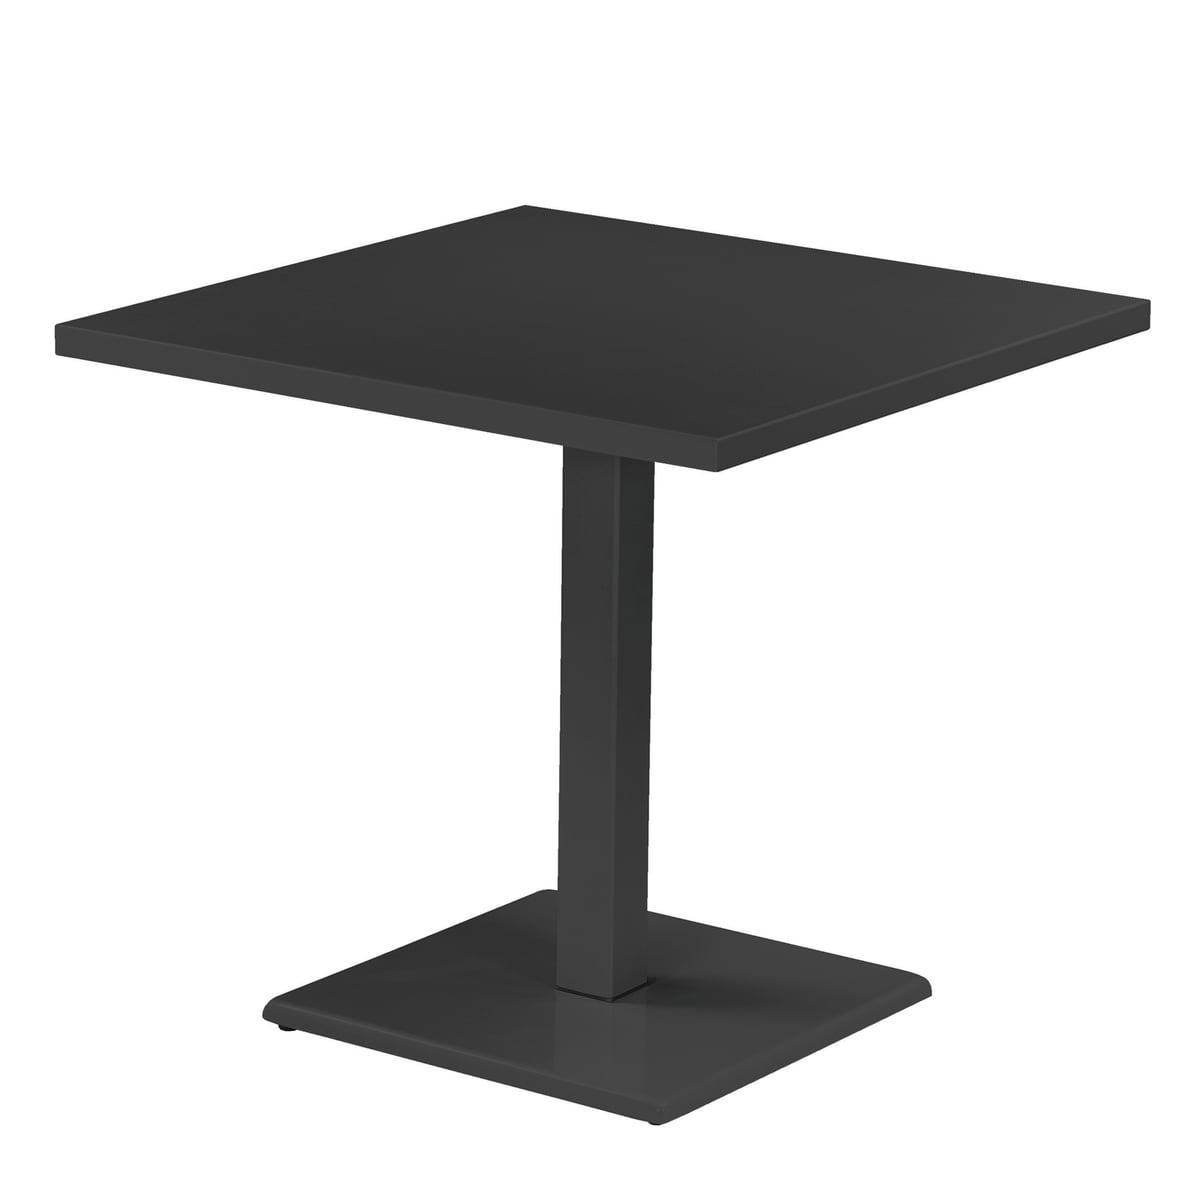 Der Emu   Round Table H 75 Cm, 80 X 80 Cm, Antique Iron Design Ideas